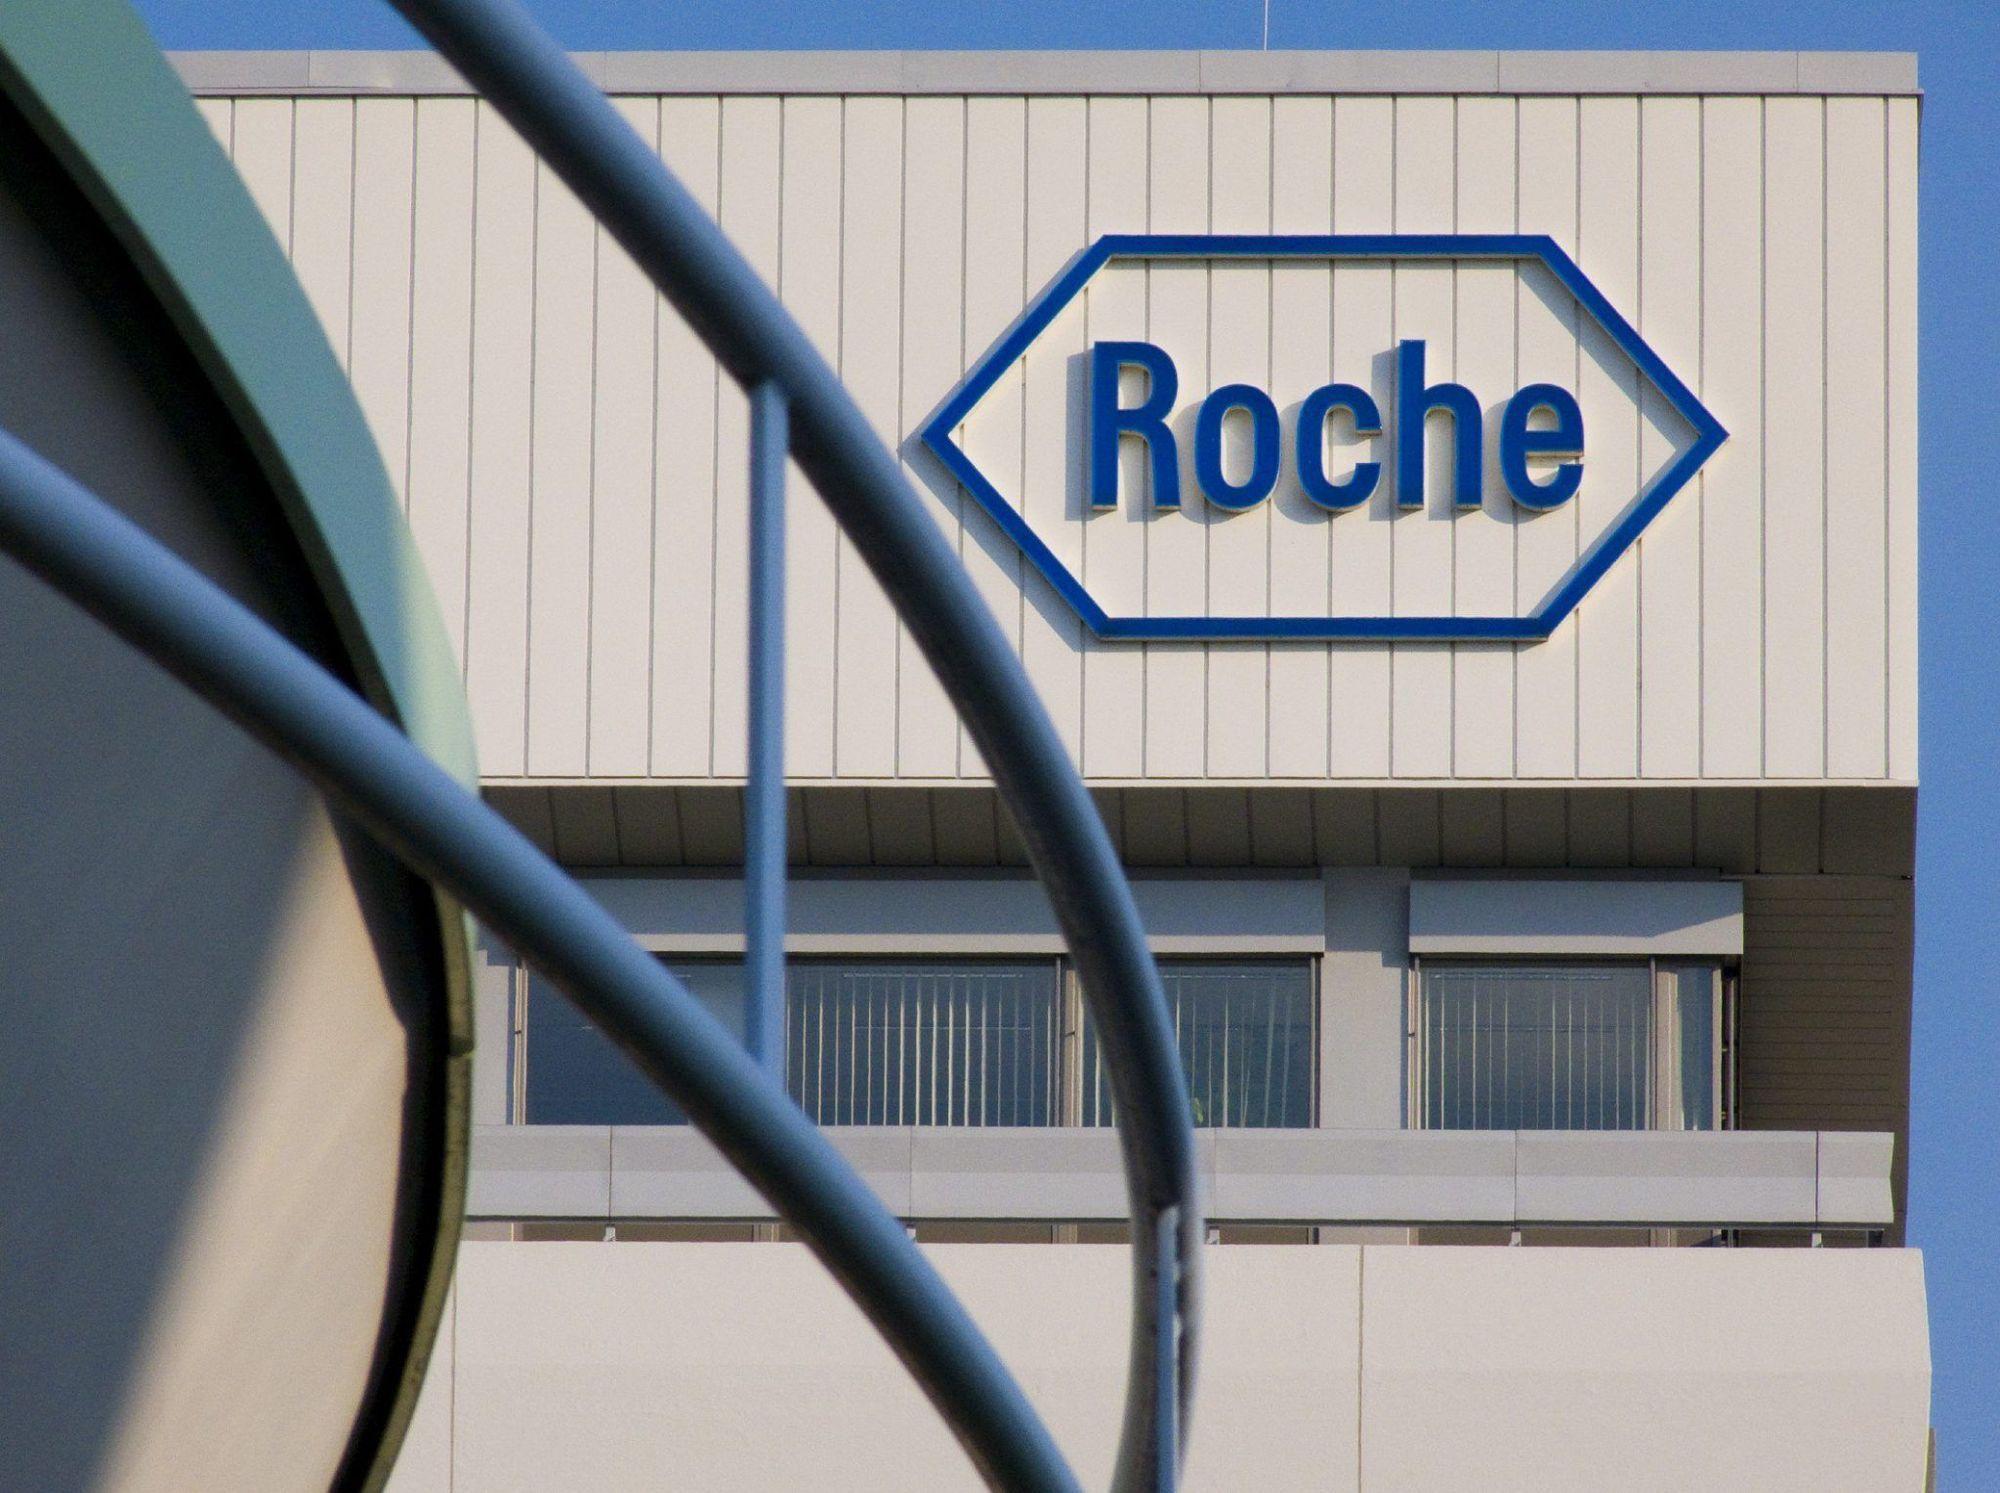 Roche Hellas: Για περισσότερα από 40 χρόνια υπηρετεί τους  ασθενείς